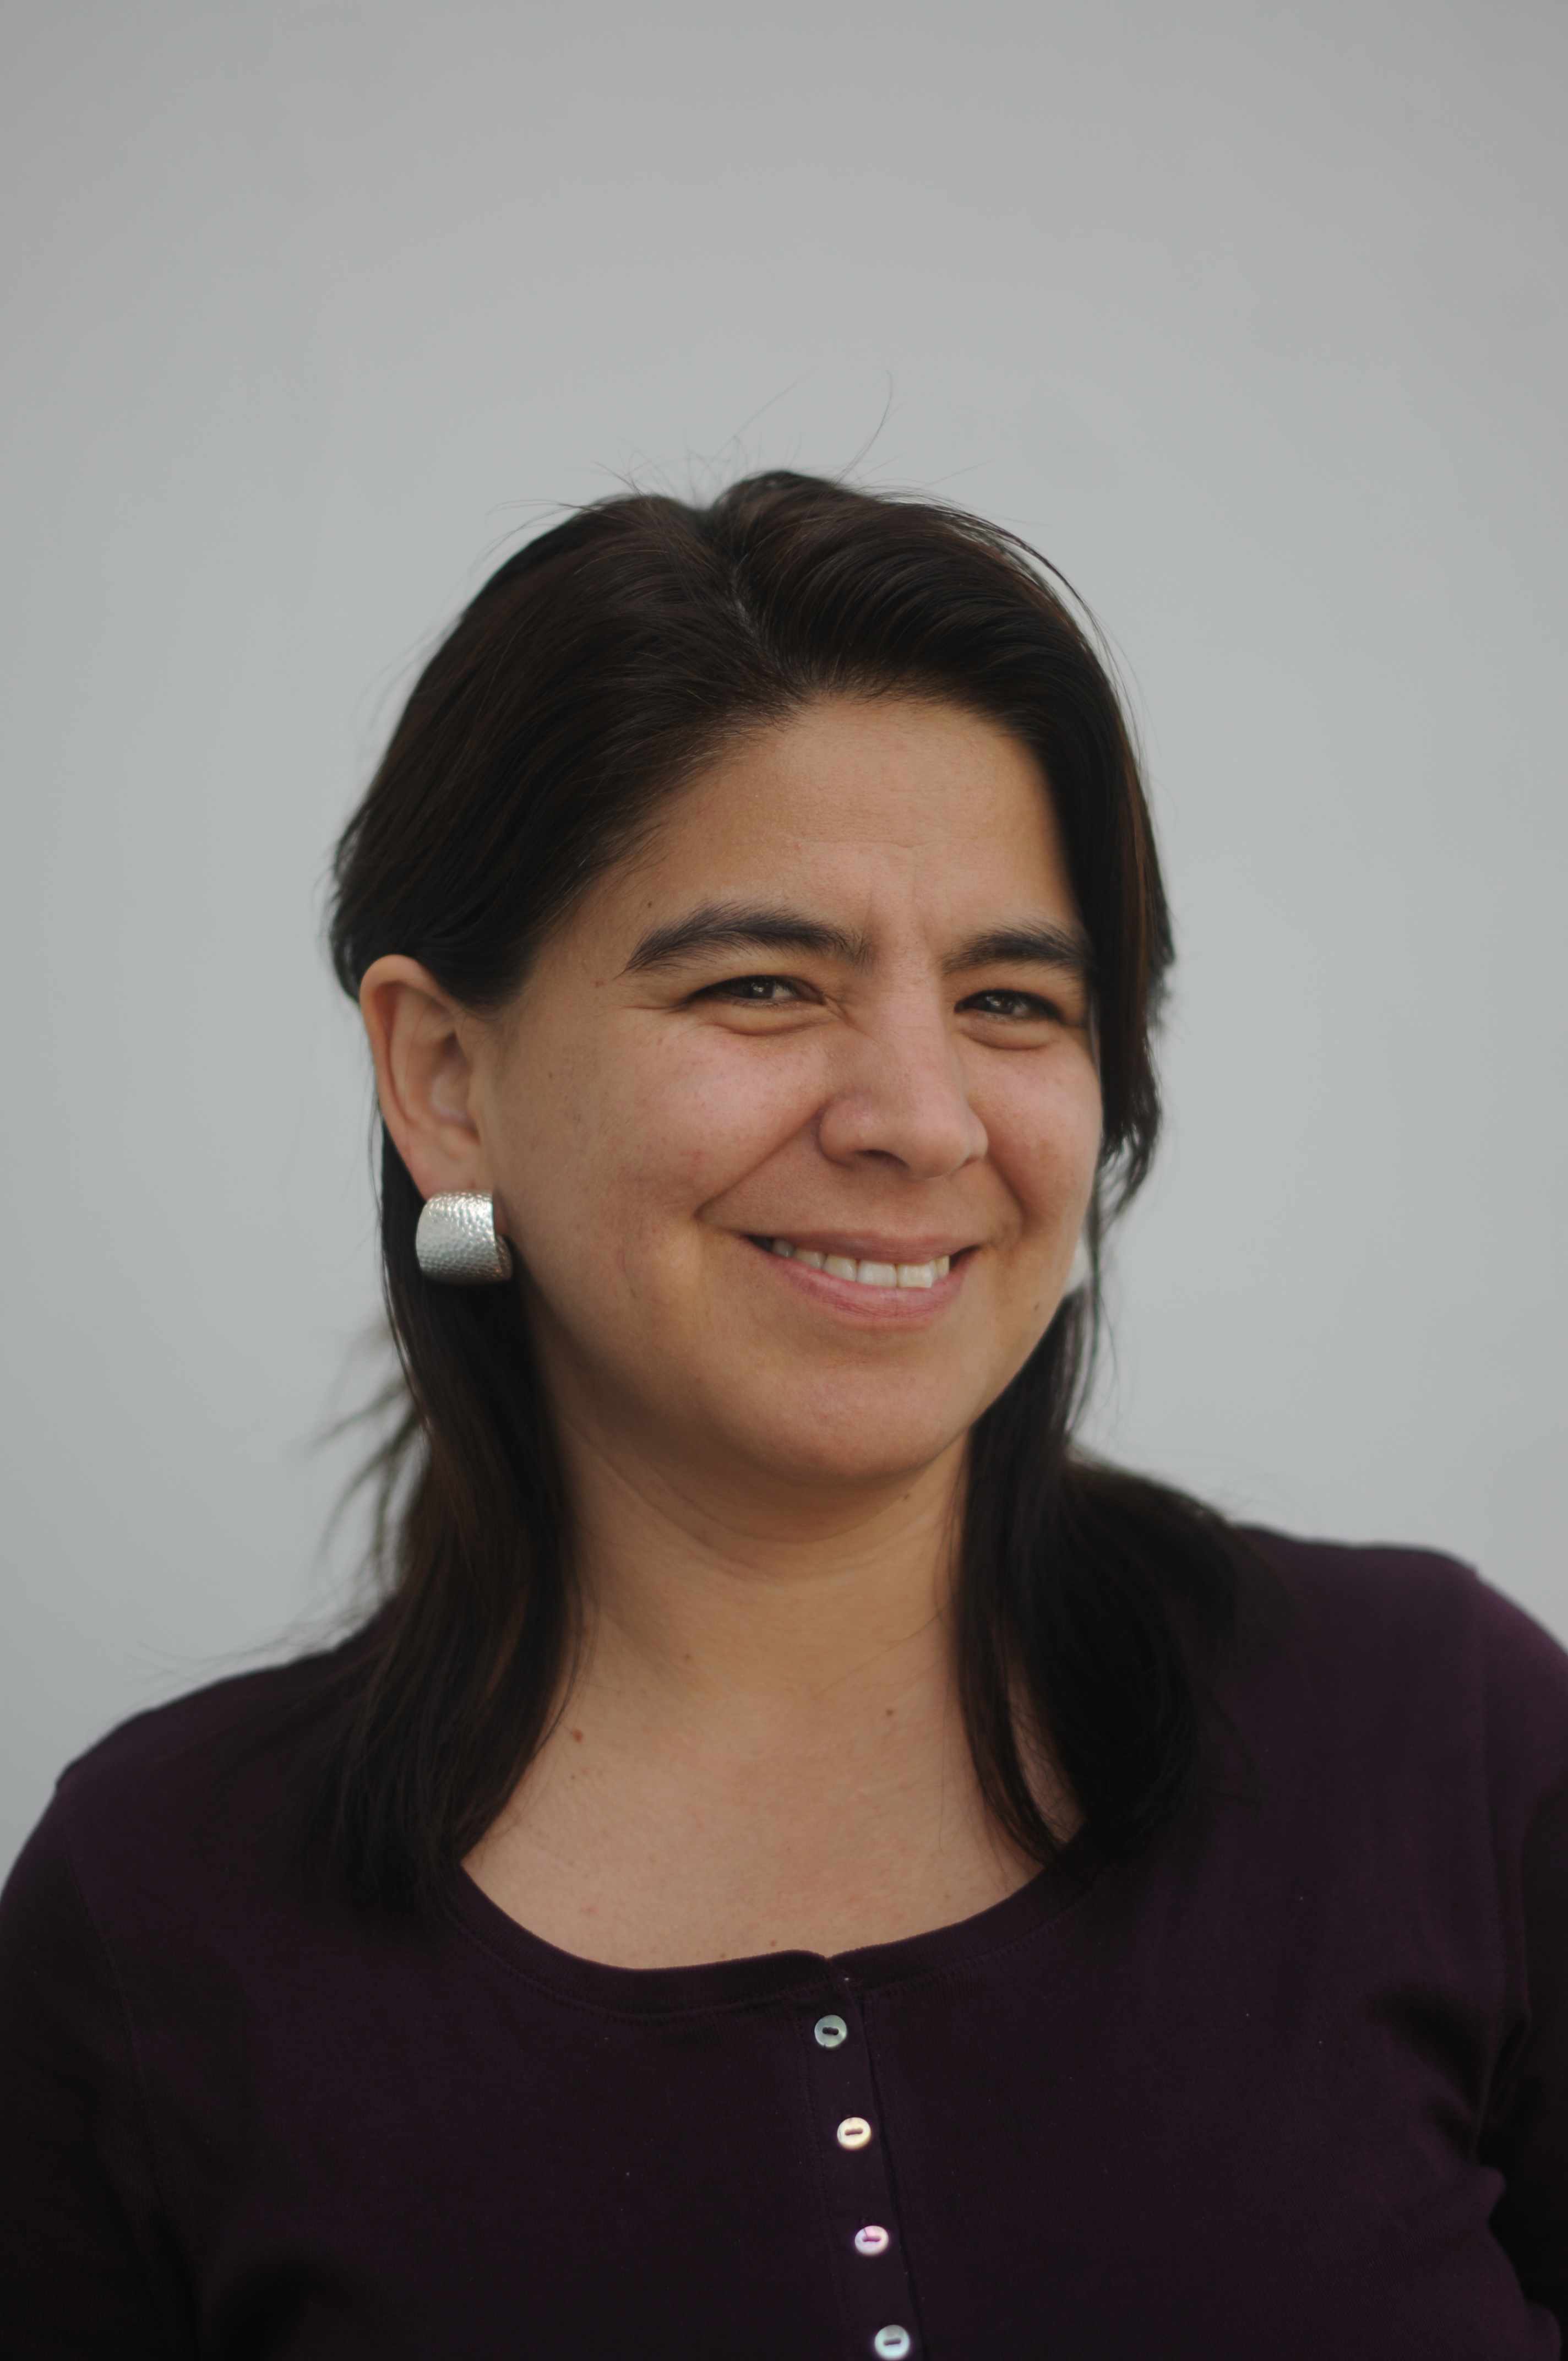 Paola Ugaz. (Courtesy)